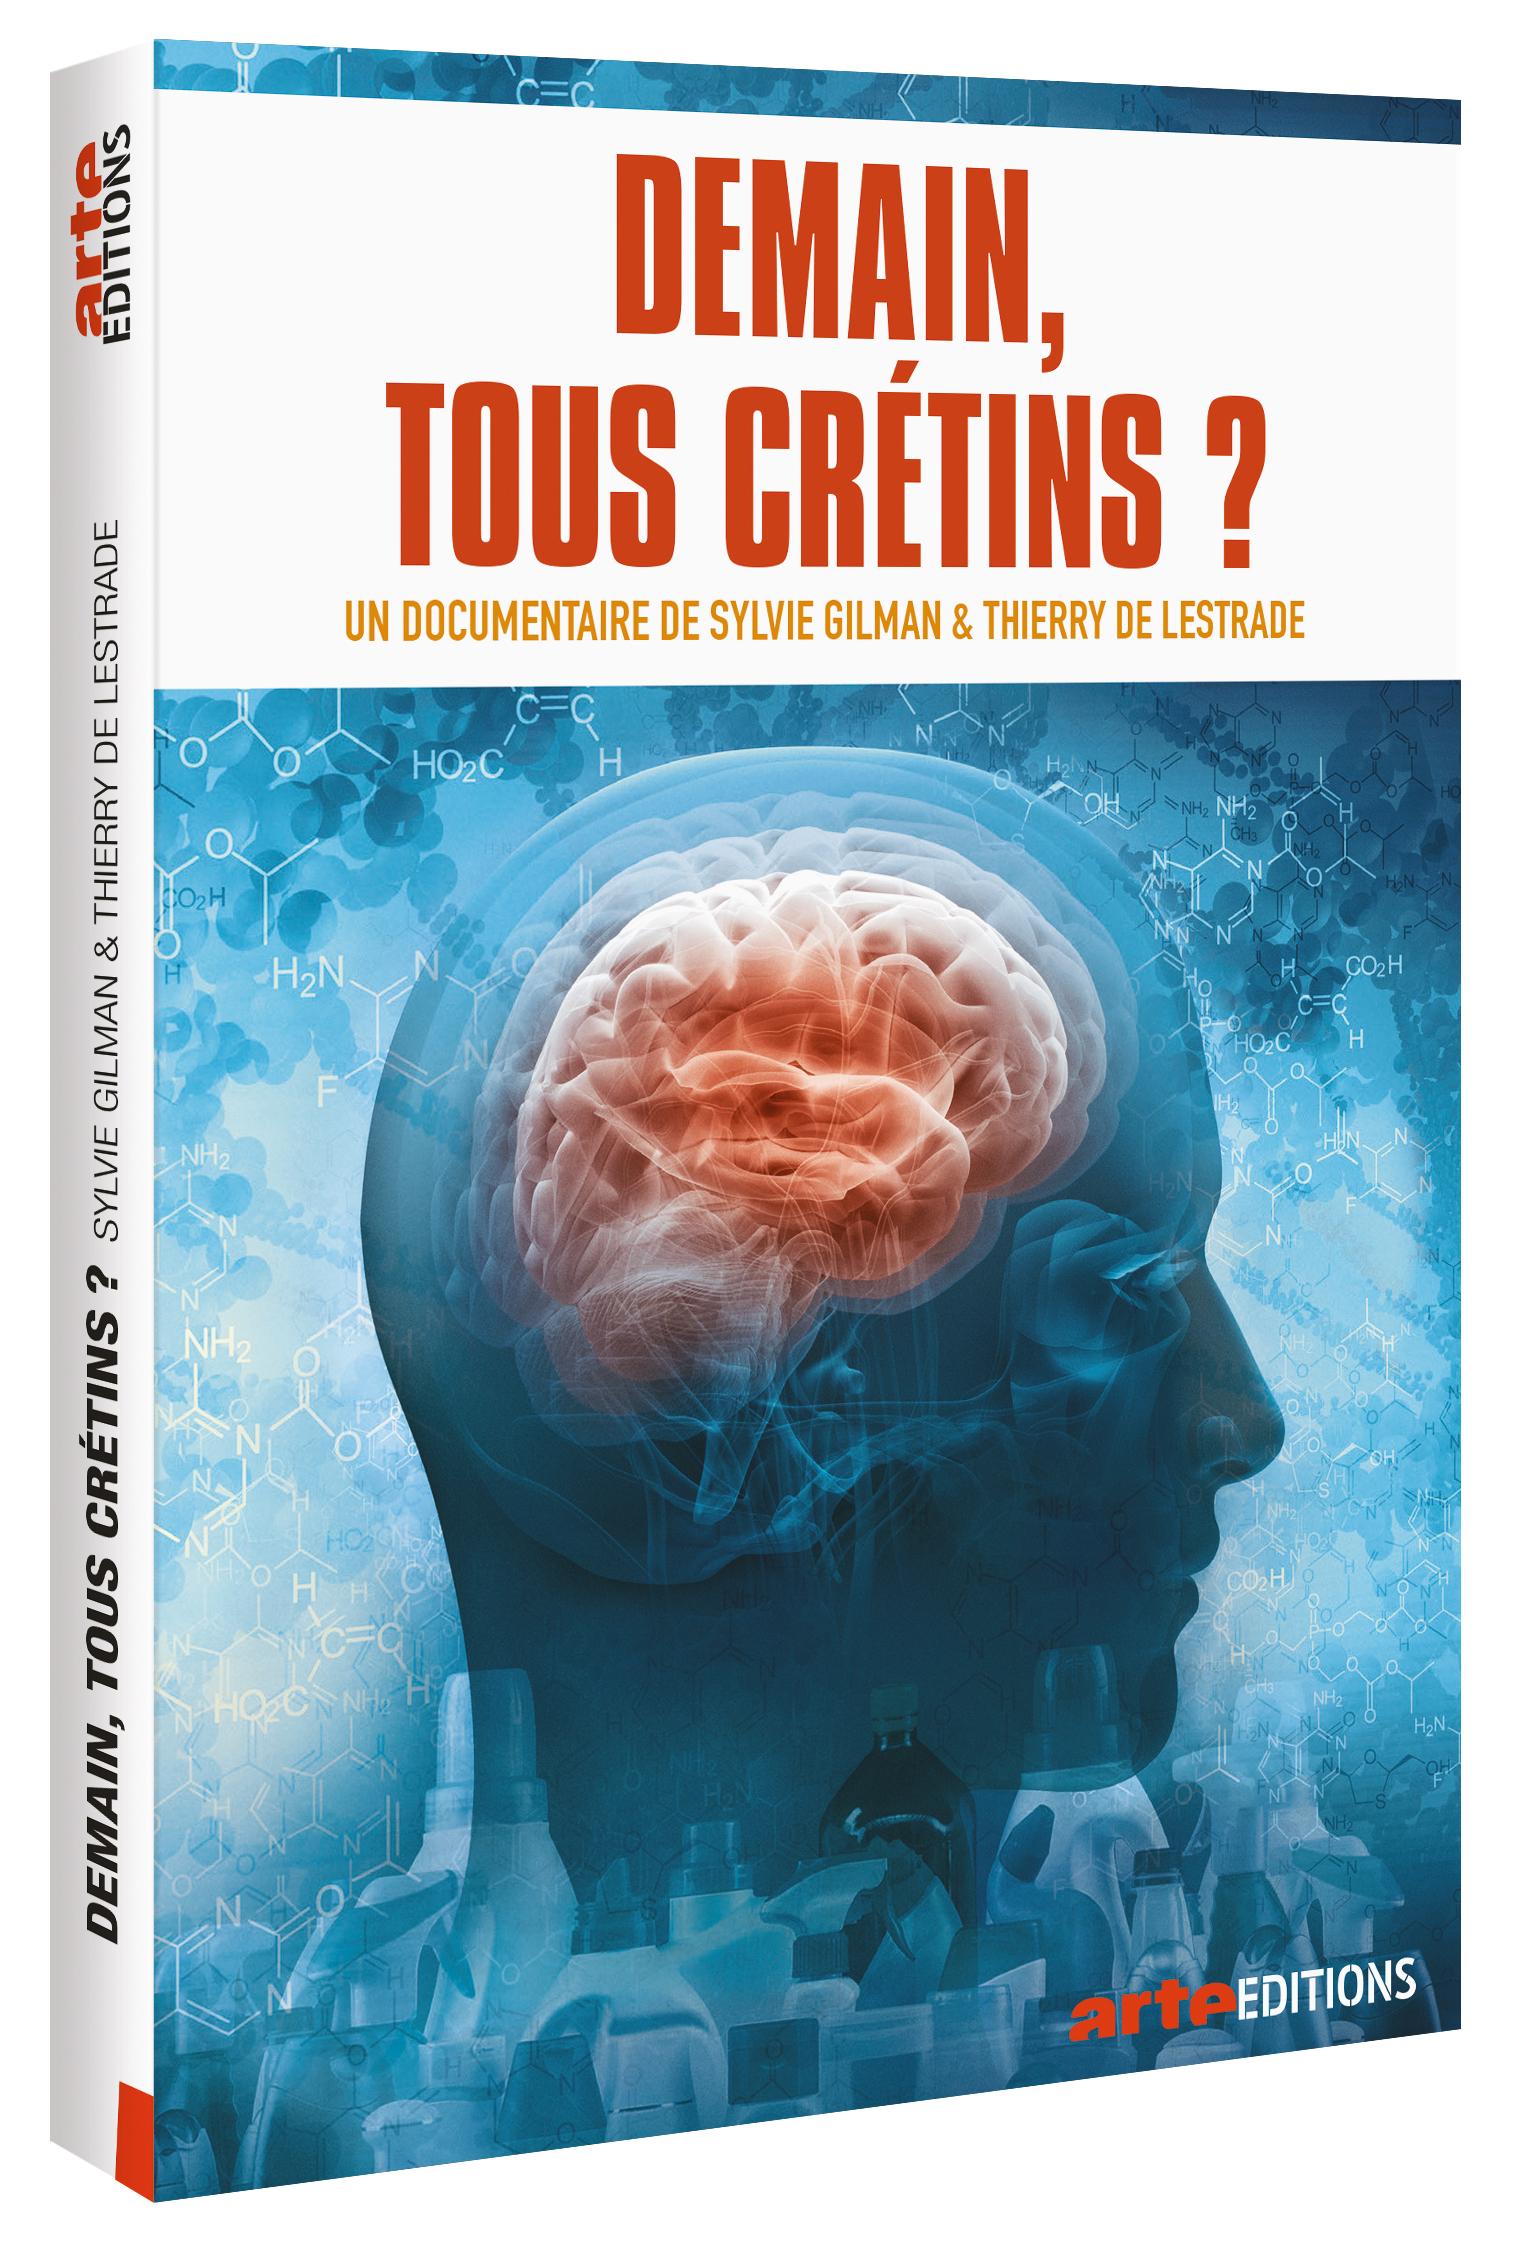 DEMAIN, TOUS CRETINS ? - DVD